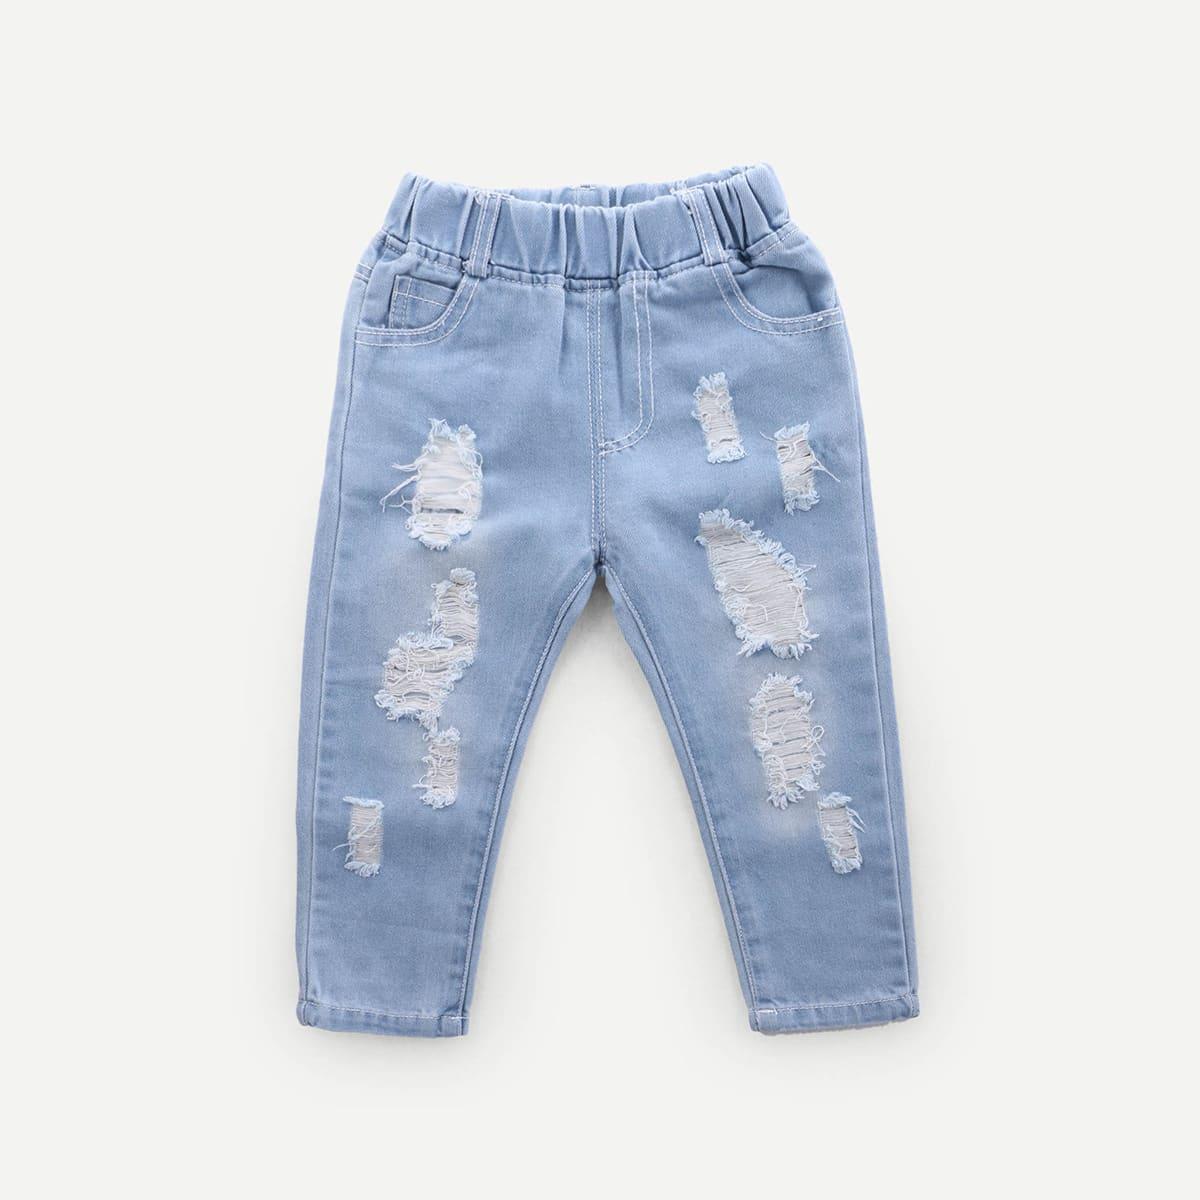 Blauw Casual Vlak Kleutermeisje jeans Gescheurd